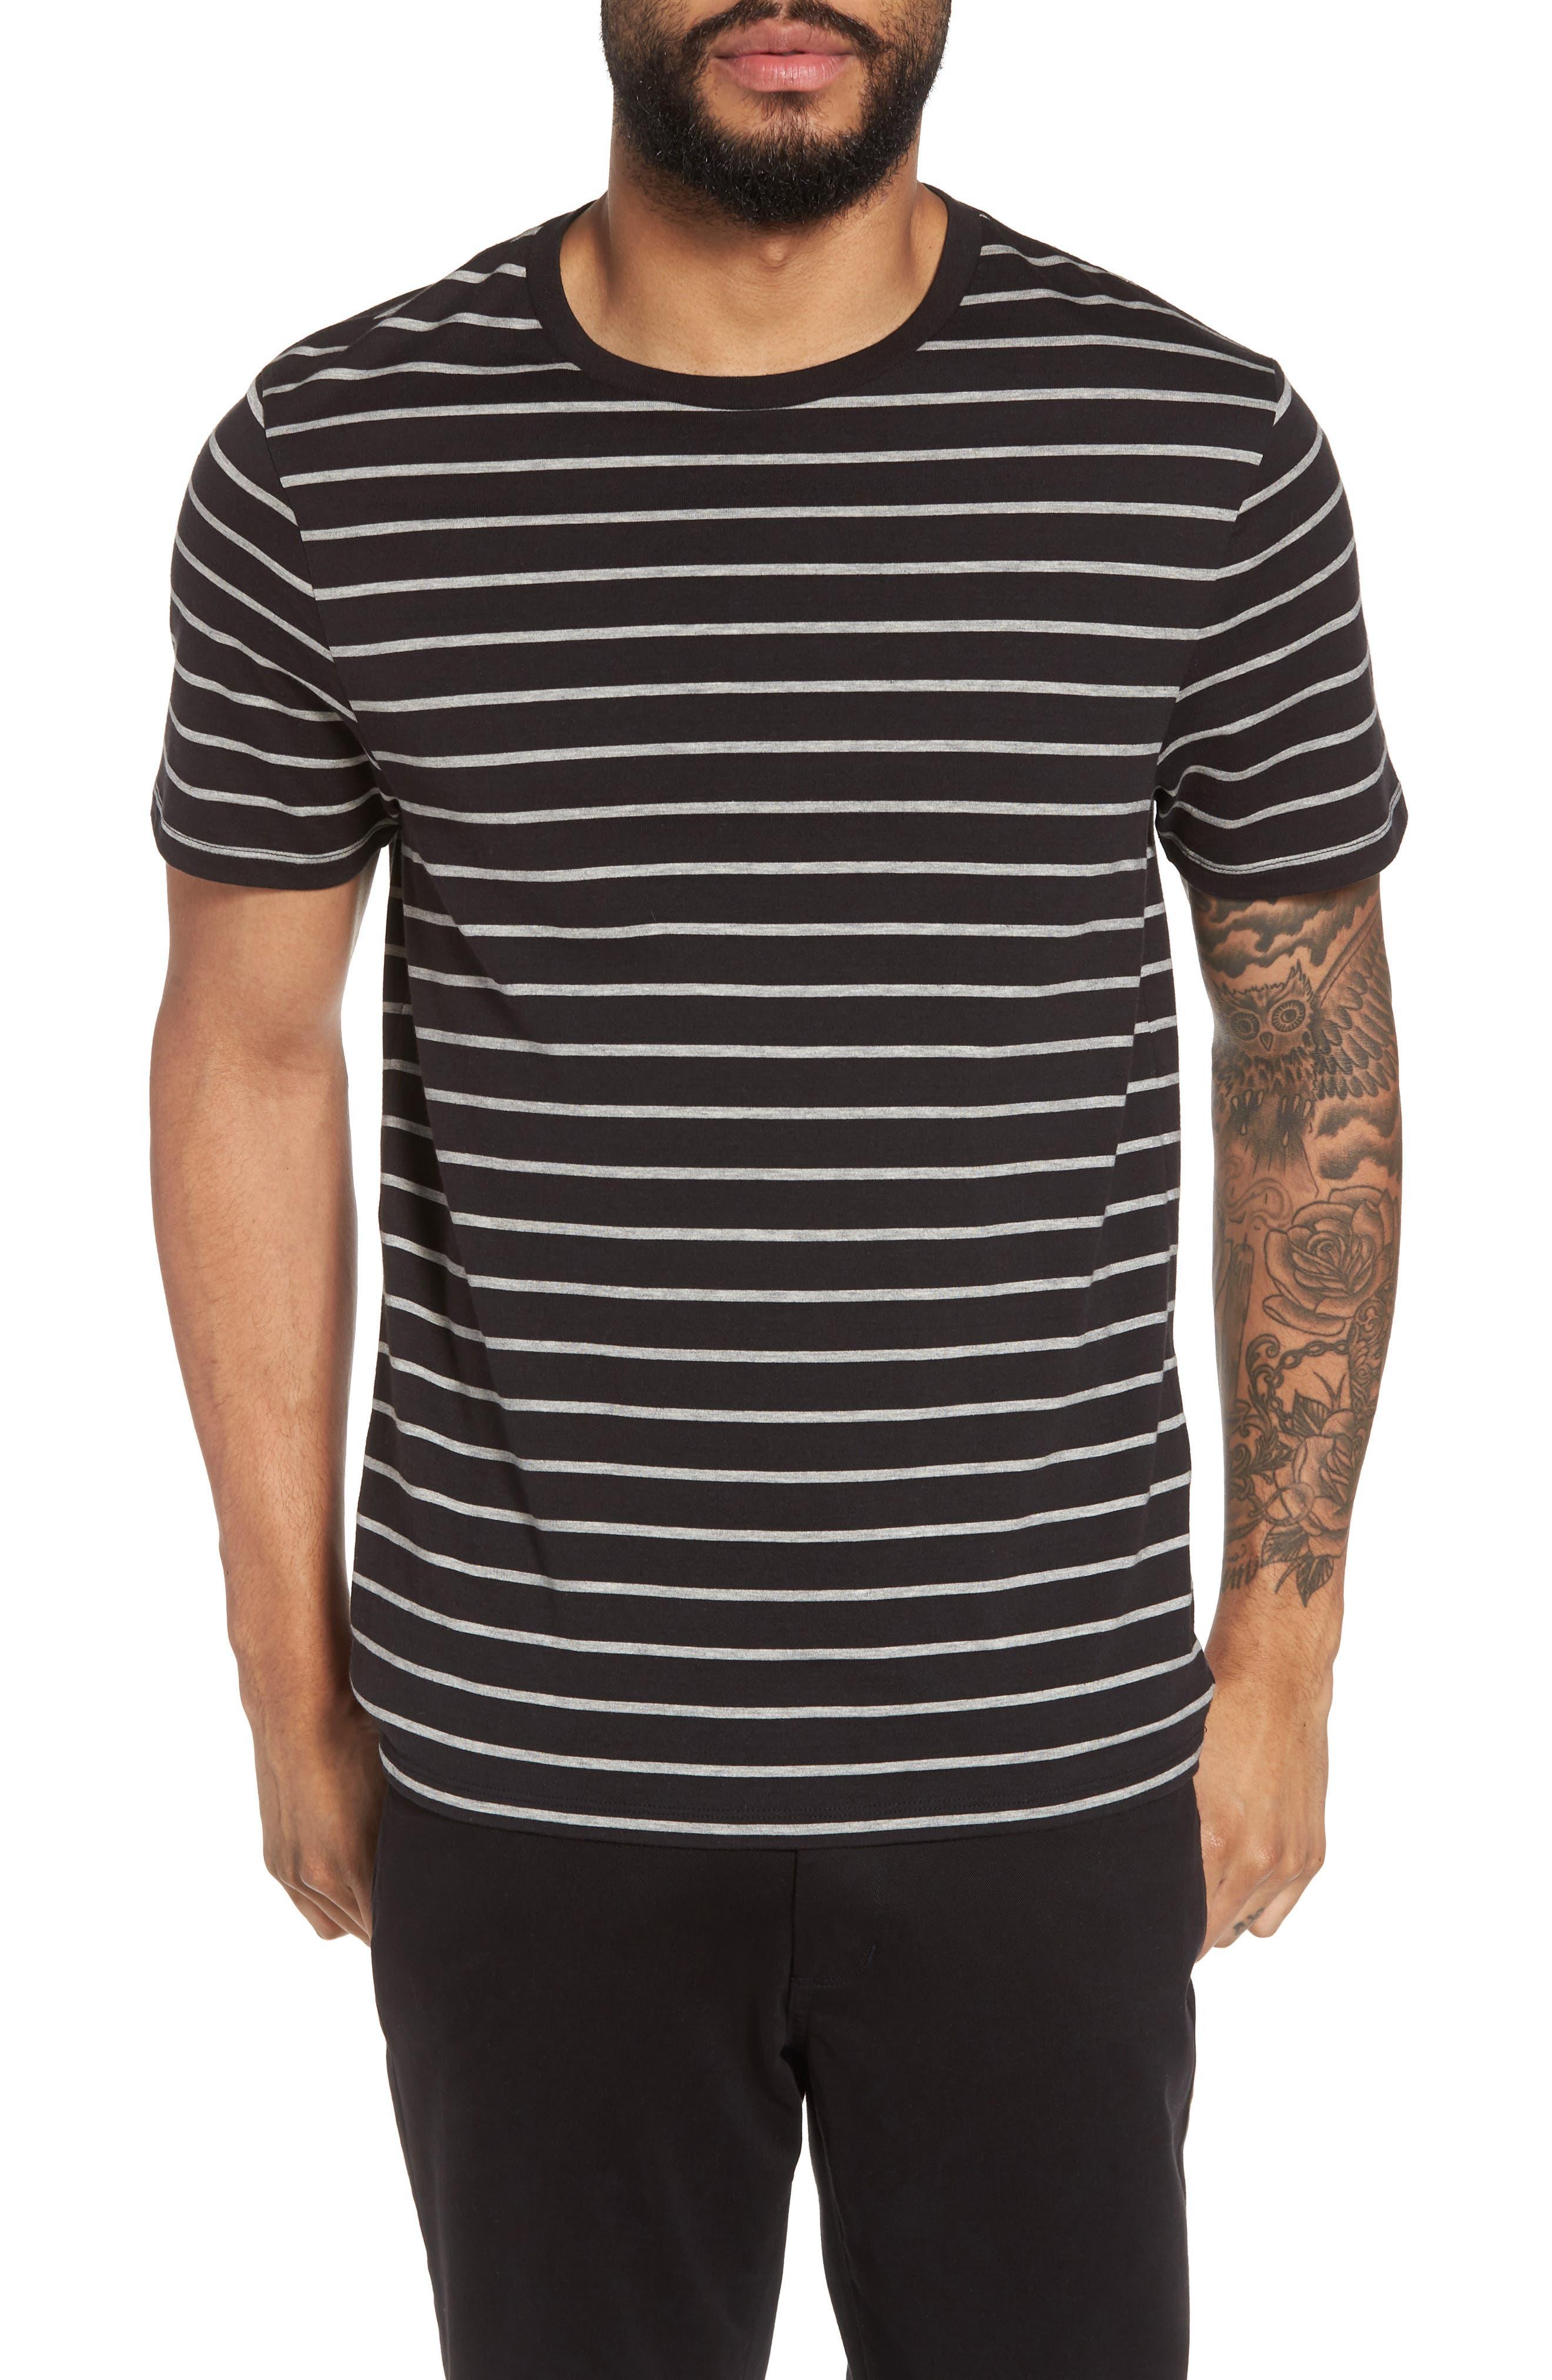 Slim Fit Heathered Stripe T-Shirt,                         Main,                         color, Black/ Heather Steel